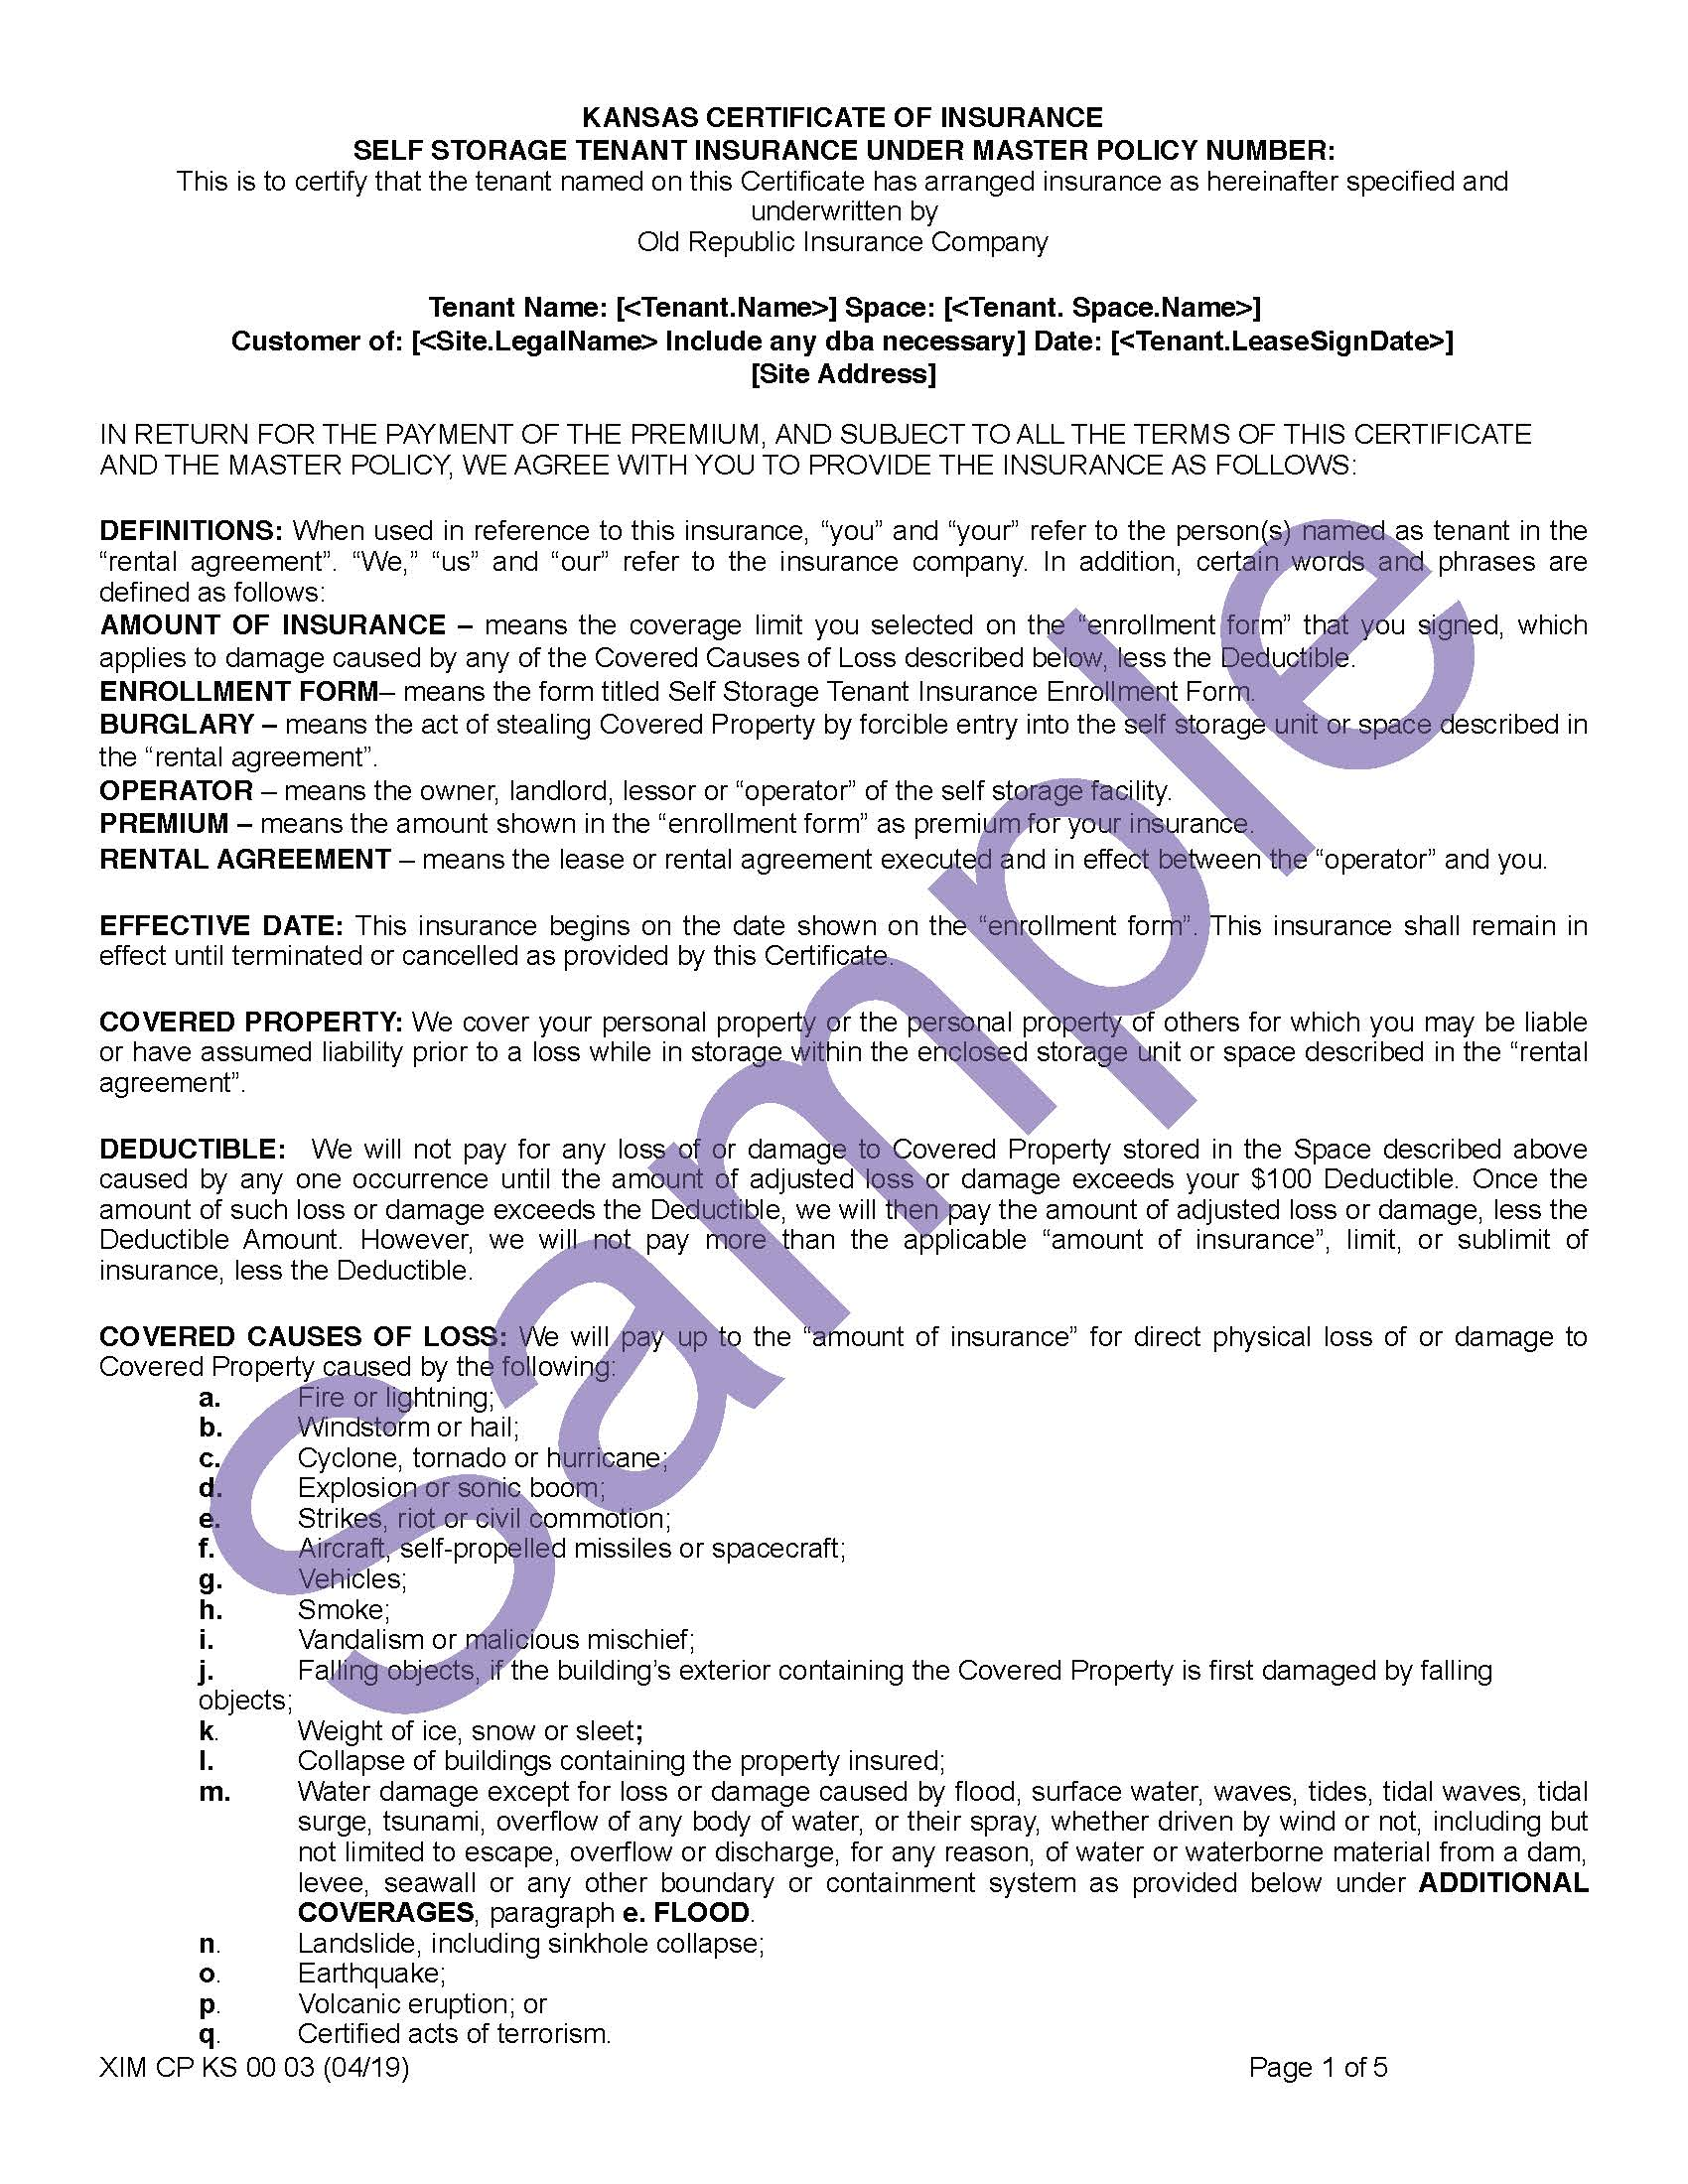 XIM CP KS 00 03 04 19 Kansas Certificate of InsuranceSample_Page_1.jpg